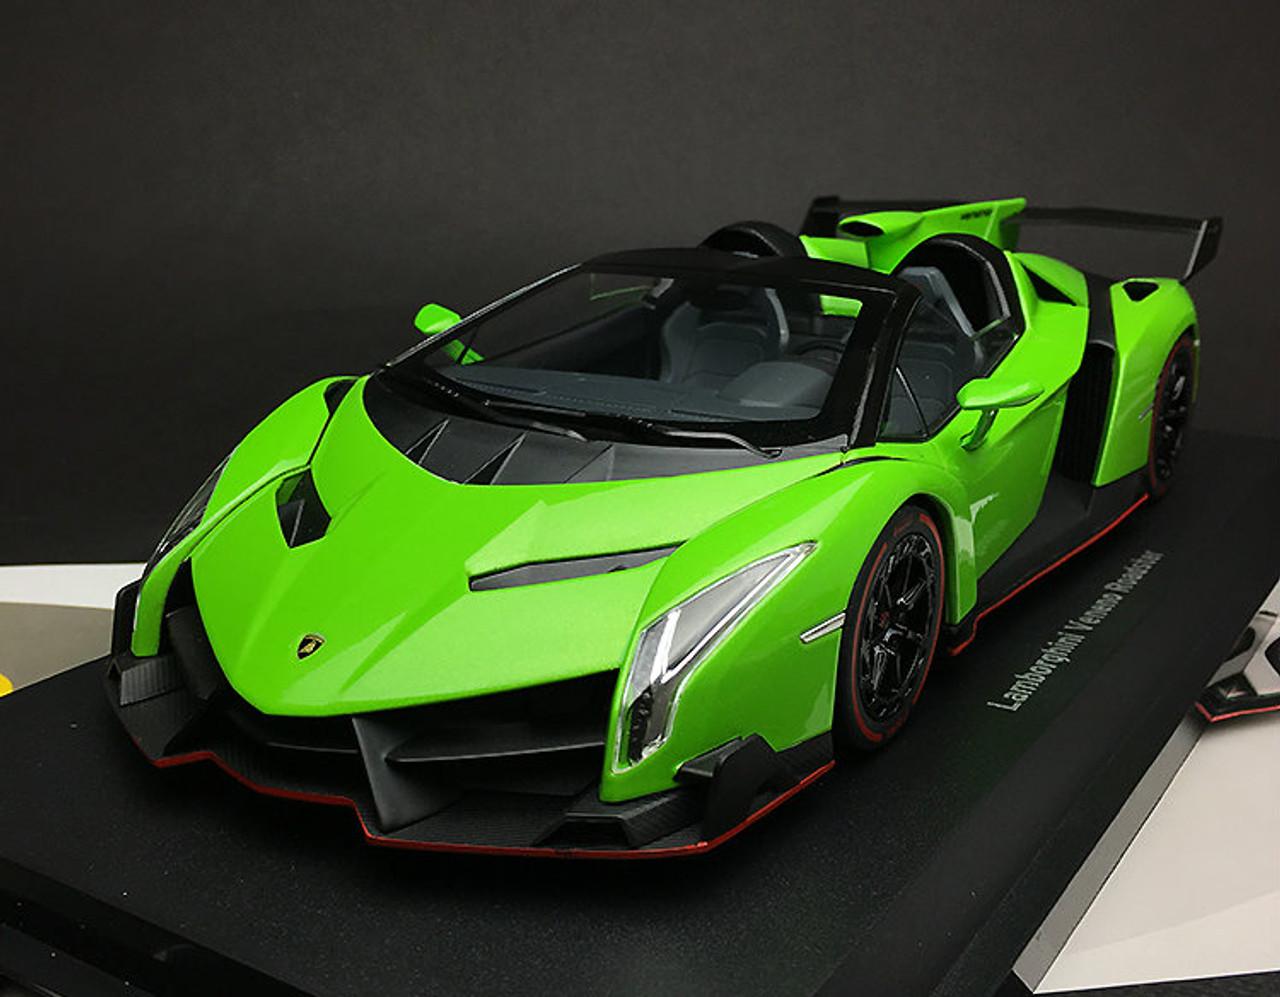 1/18 Kyosho Ousia Lamborghini Veneno (Green w/ Red Line) Car Model